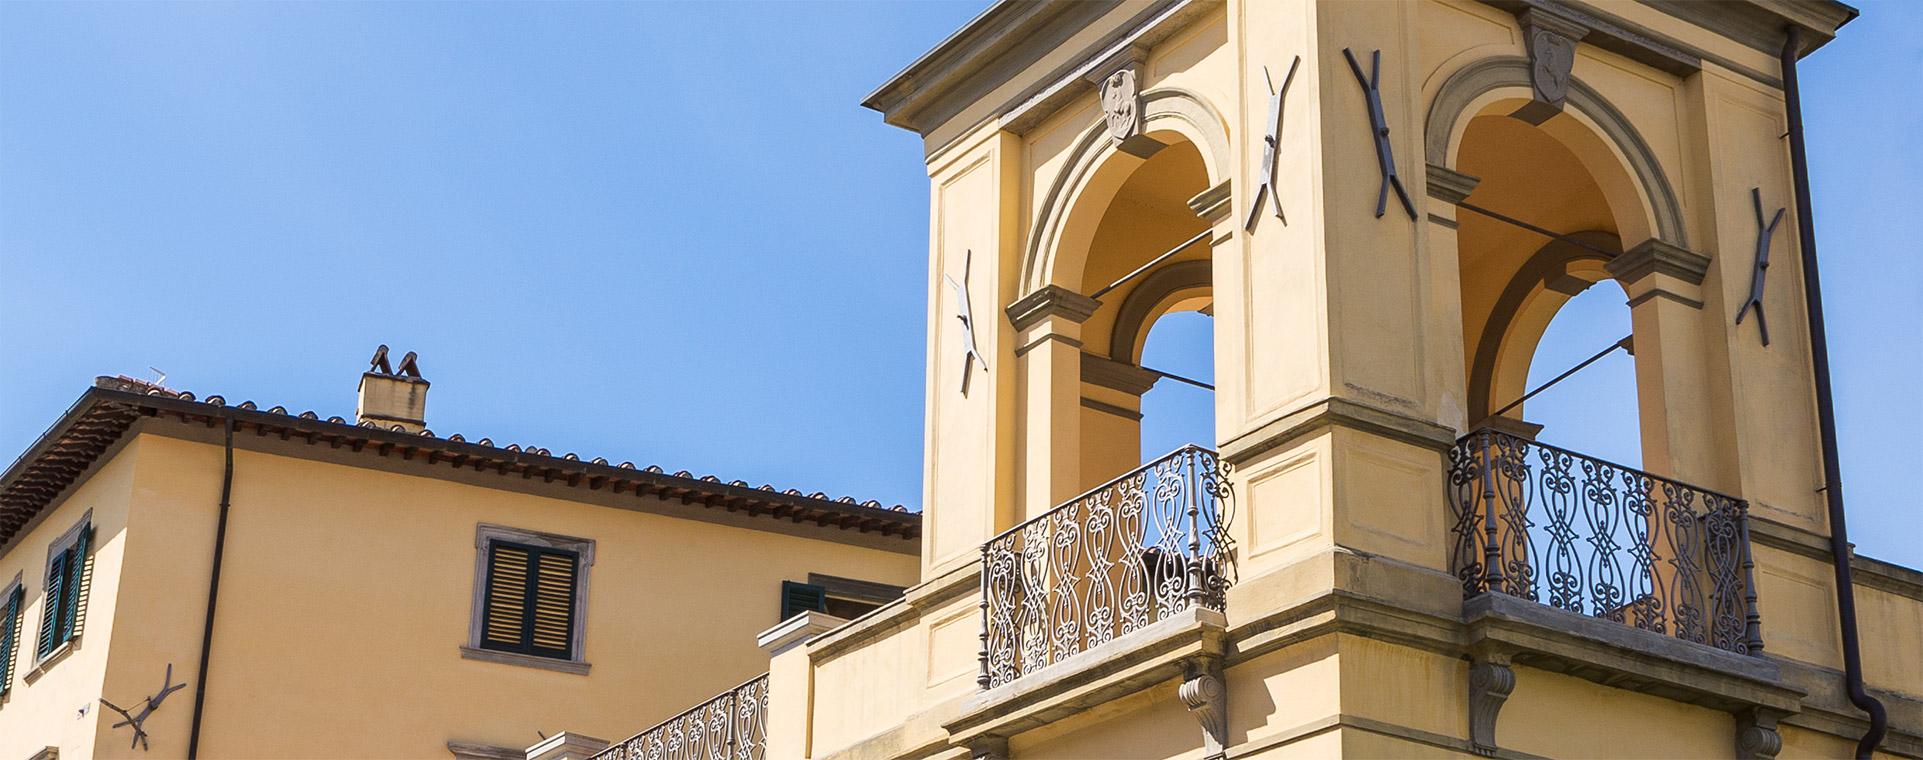 Toscana villa storica in vendita